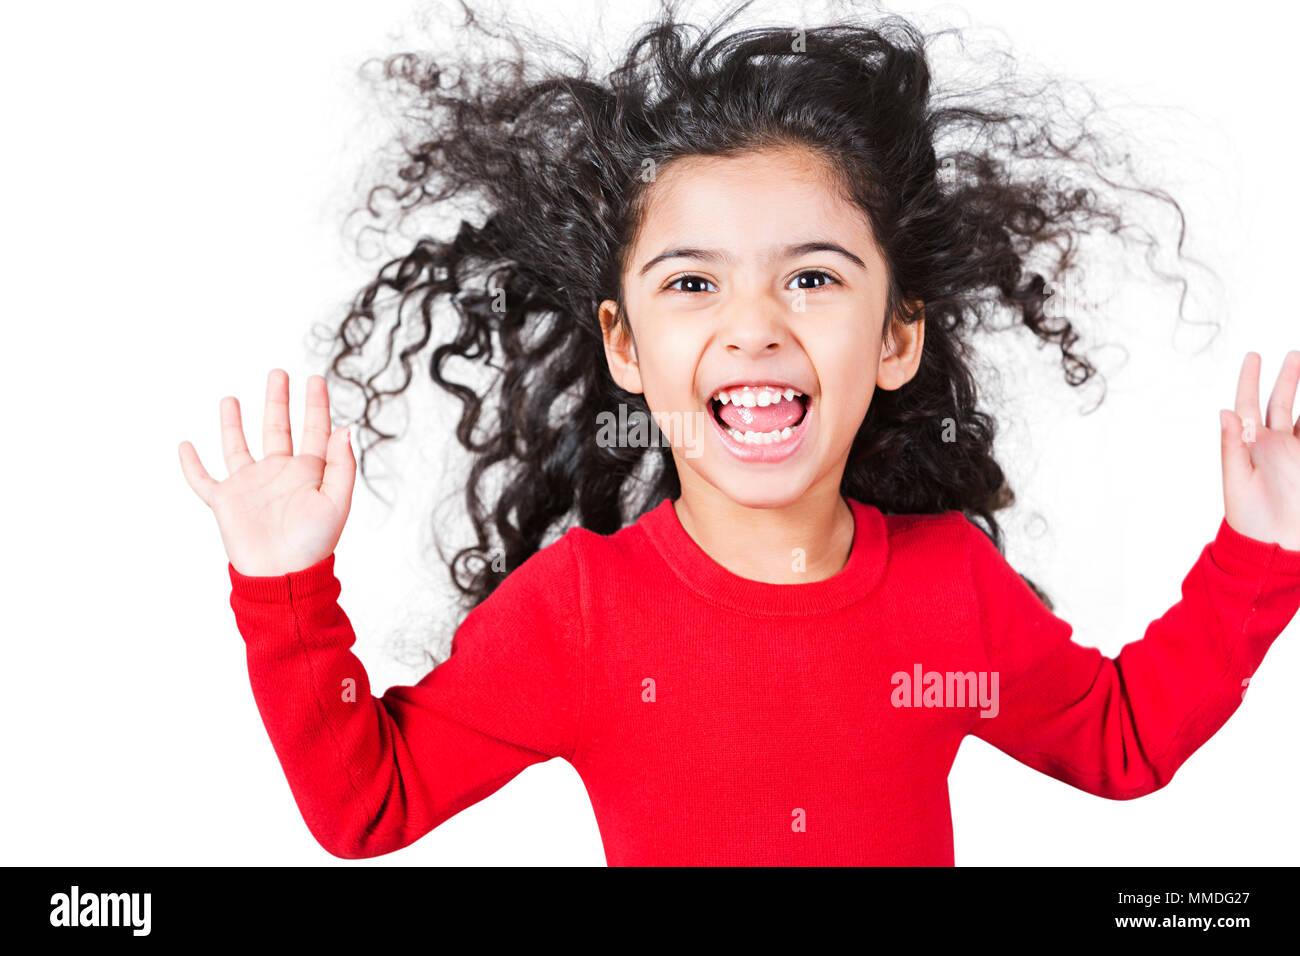 Happy Kid Girl Having Fun Cheerful Playful Shouting White Background - Stock Image